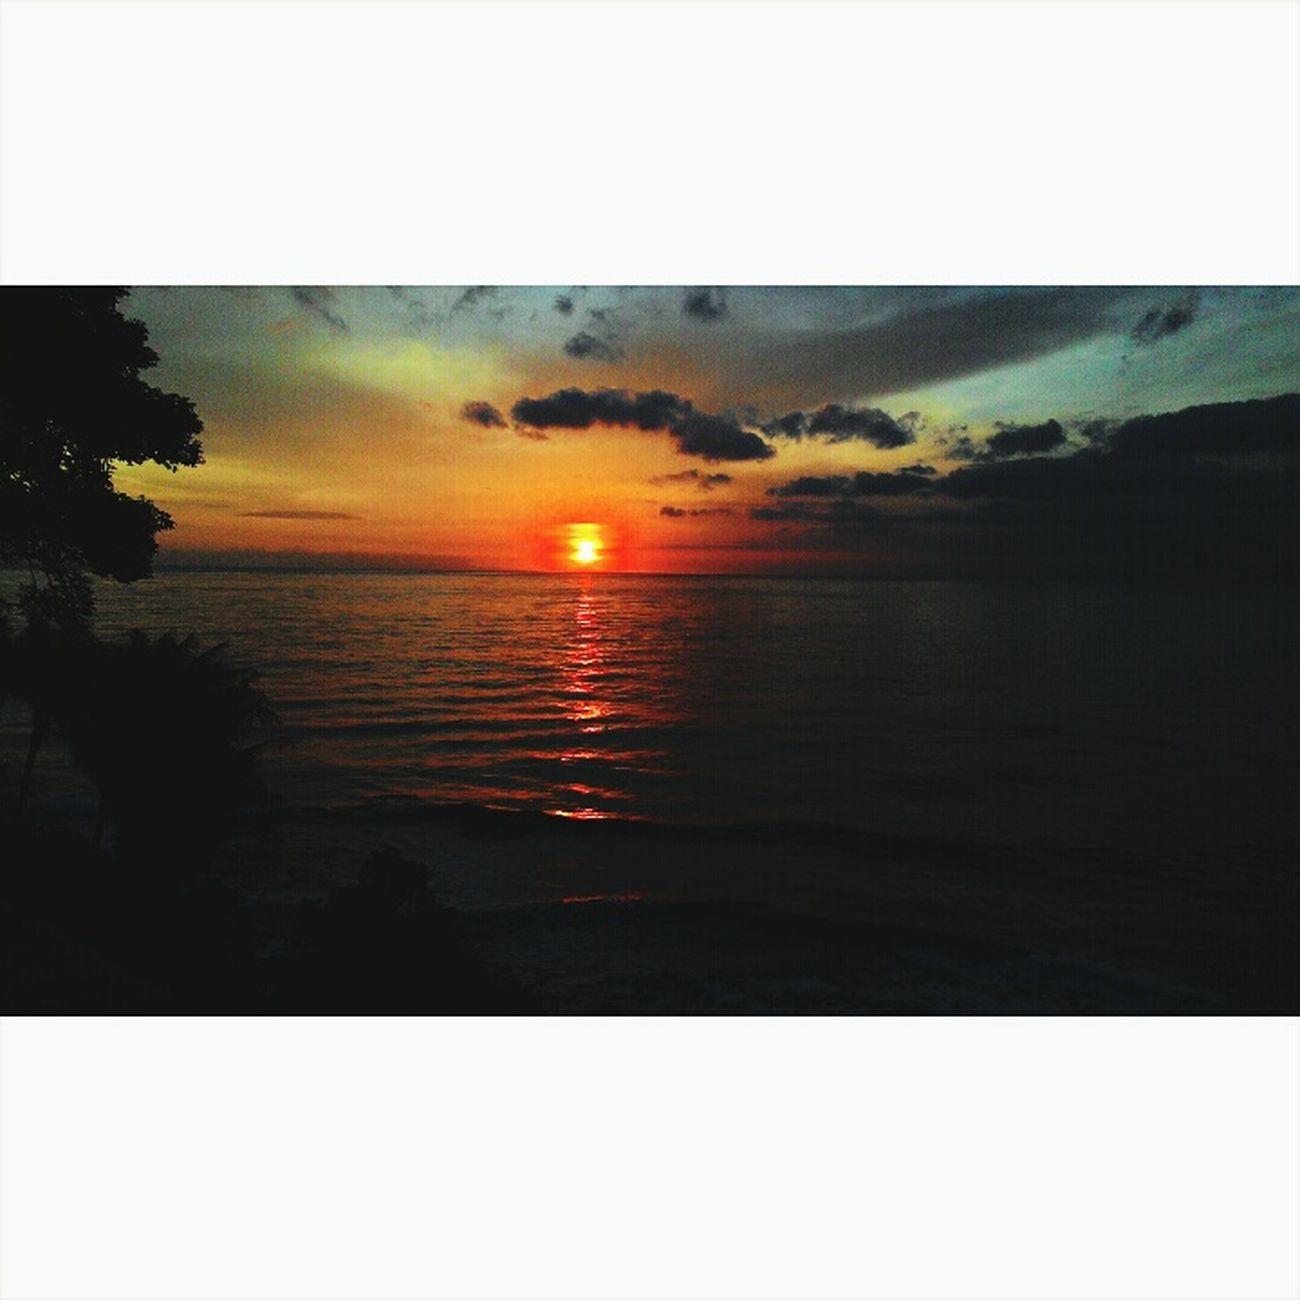 Sunset Beautiful Sunset Clouds And Sky Beach Senggigistreet  Senggigibeach Lombok-Indonesia